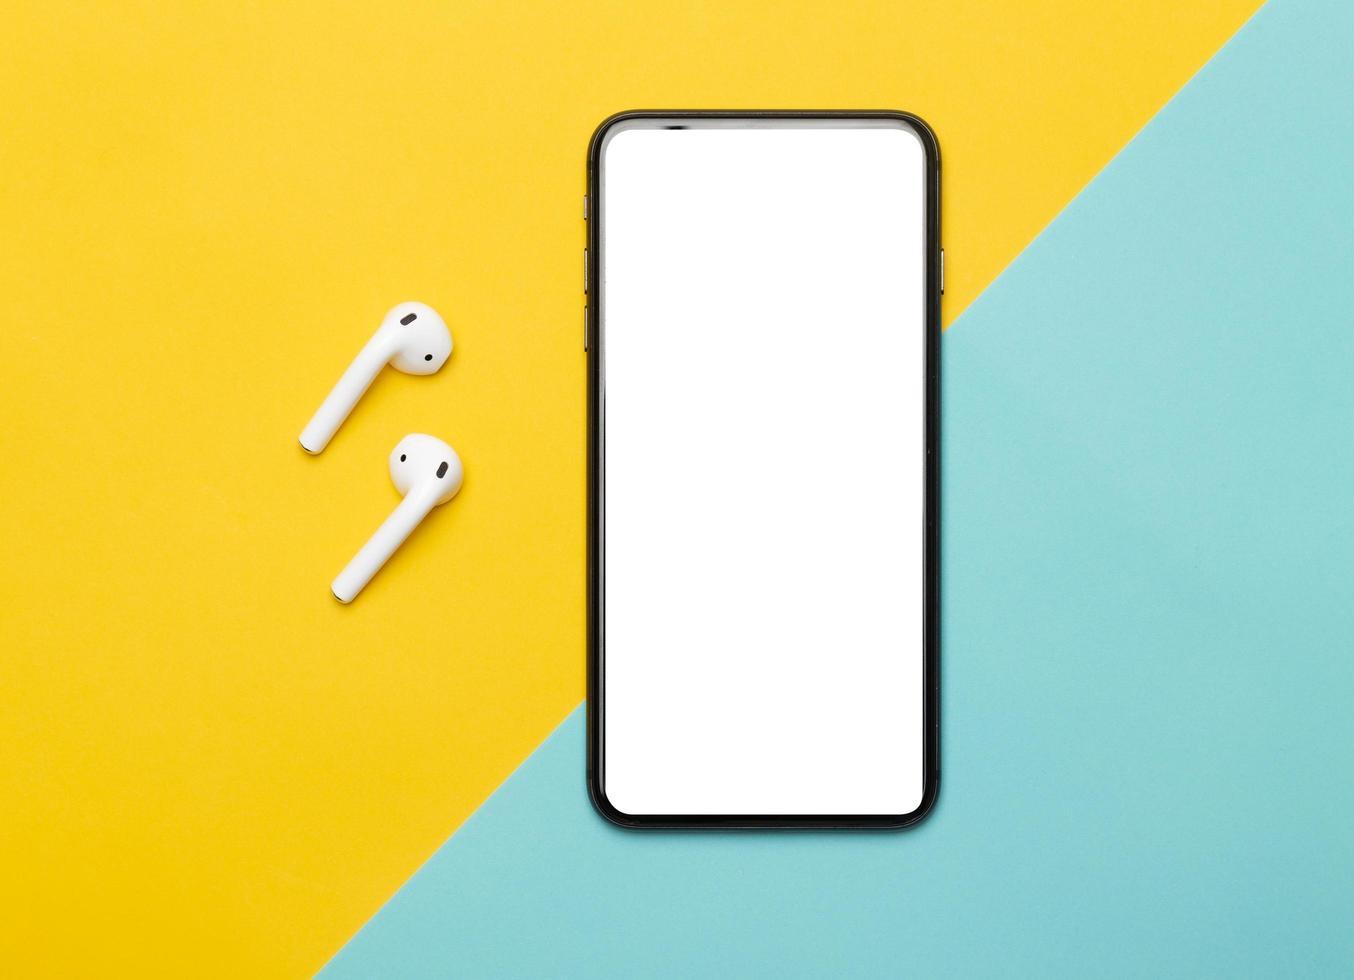 smartphone en oordopjes op gele en blauwe achtergrond foto